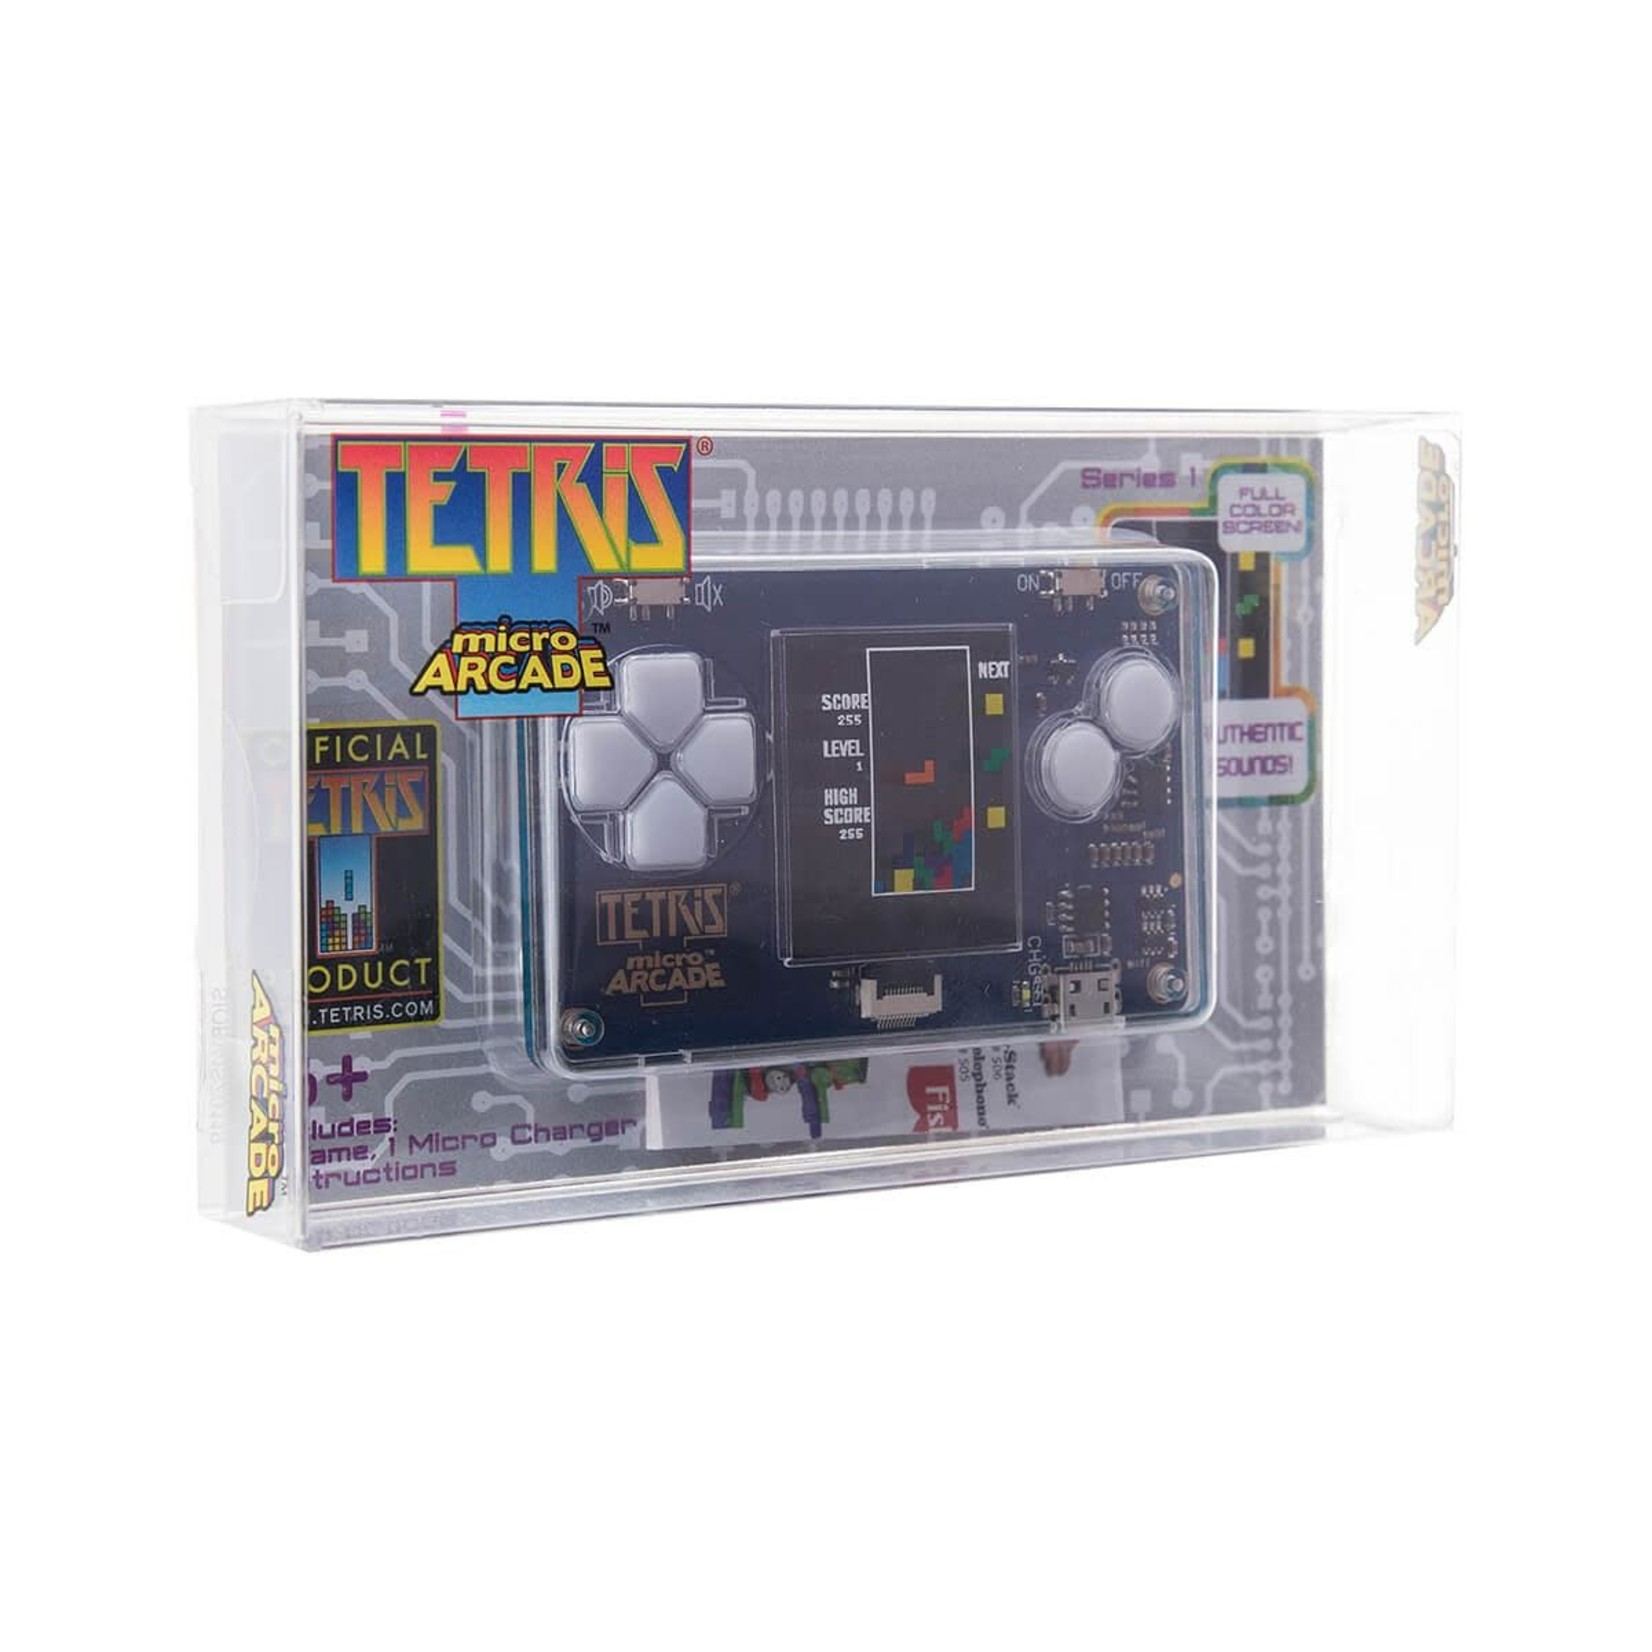 Tetris mico arcade new